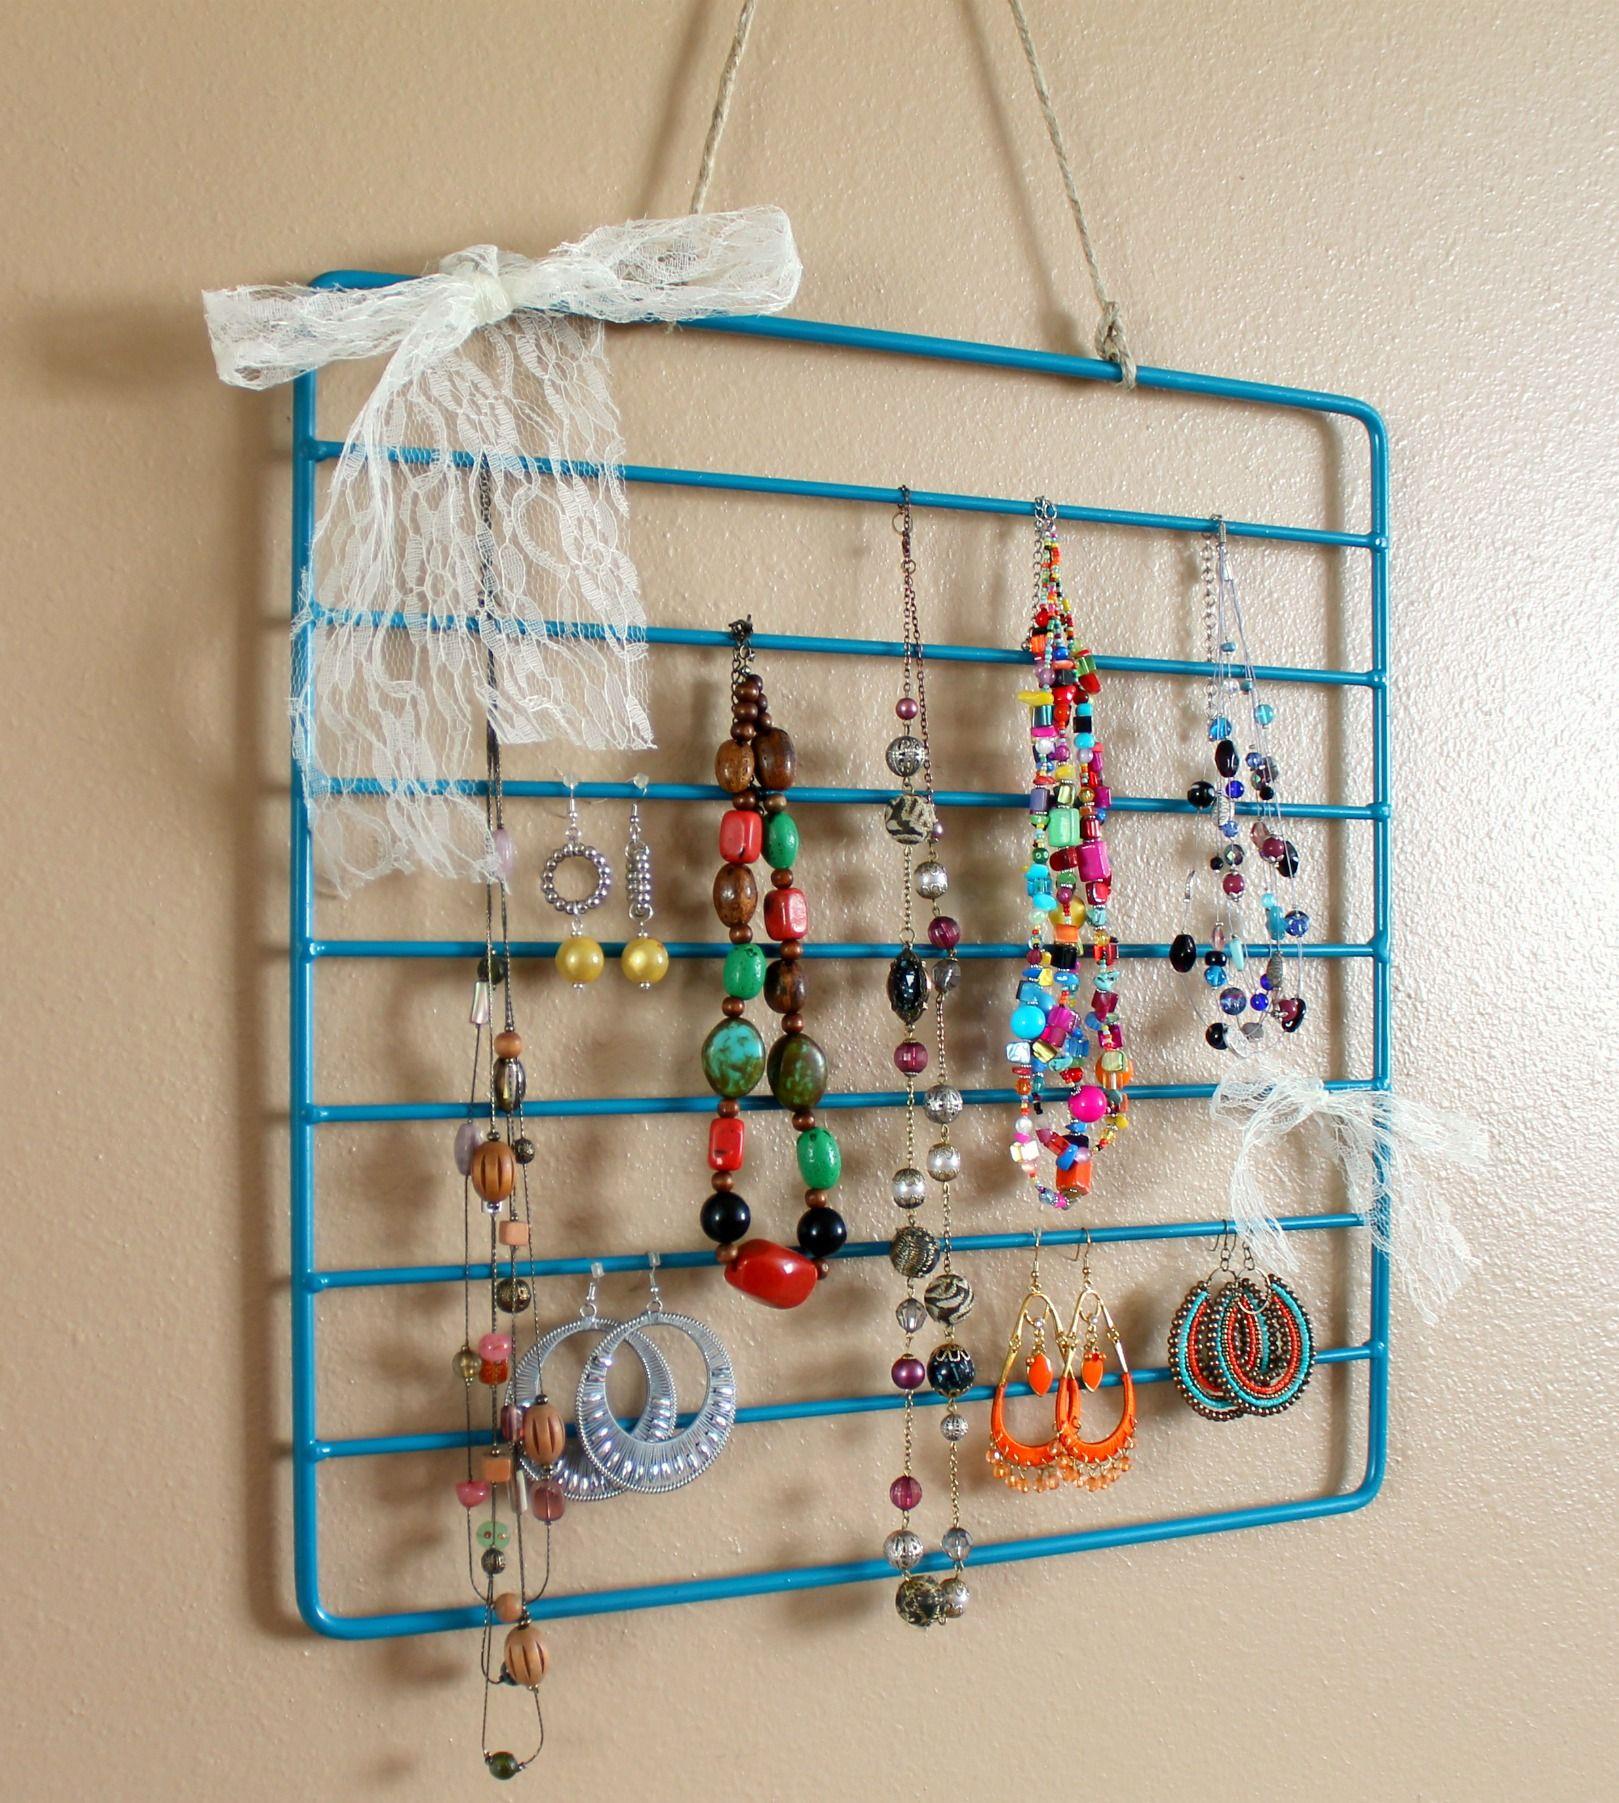 diy: oven rack to jewelry organizer | makeup maven | pinterest